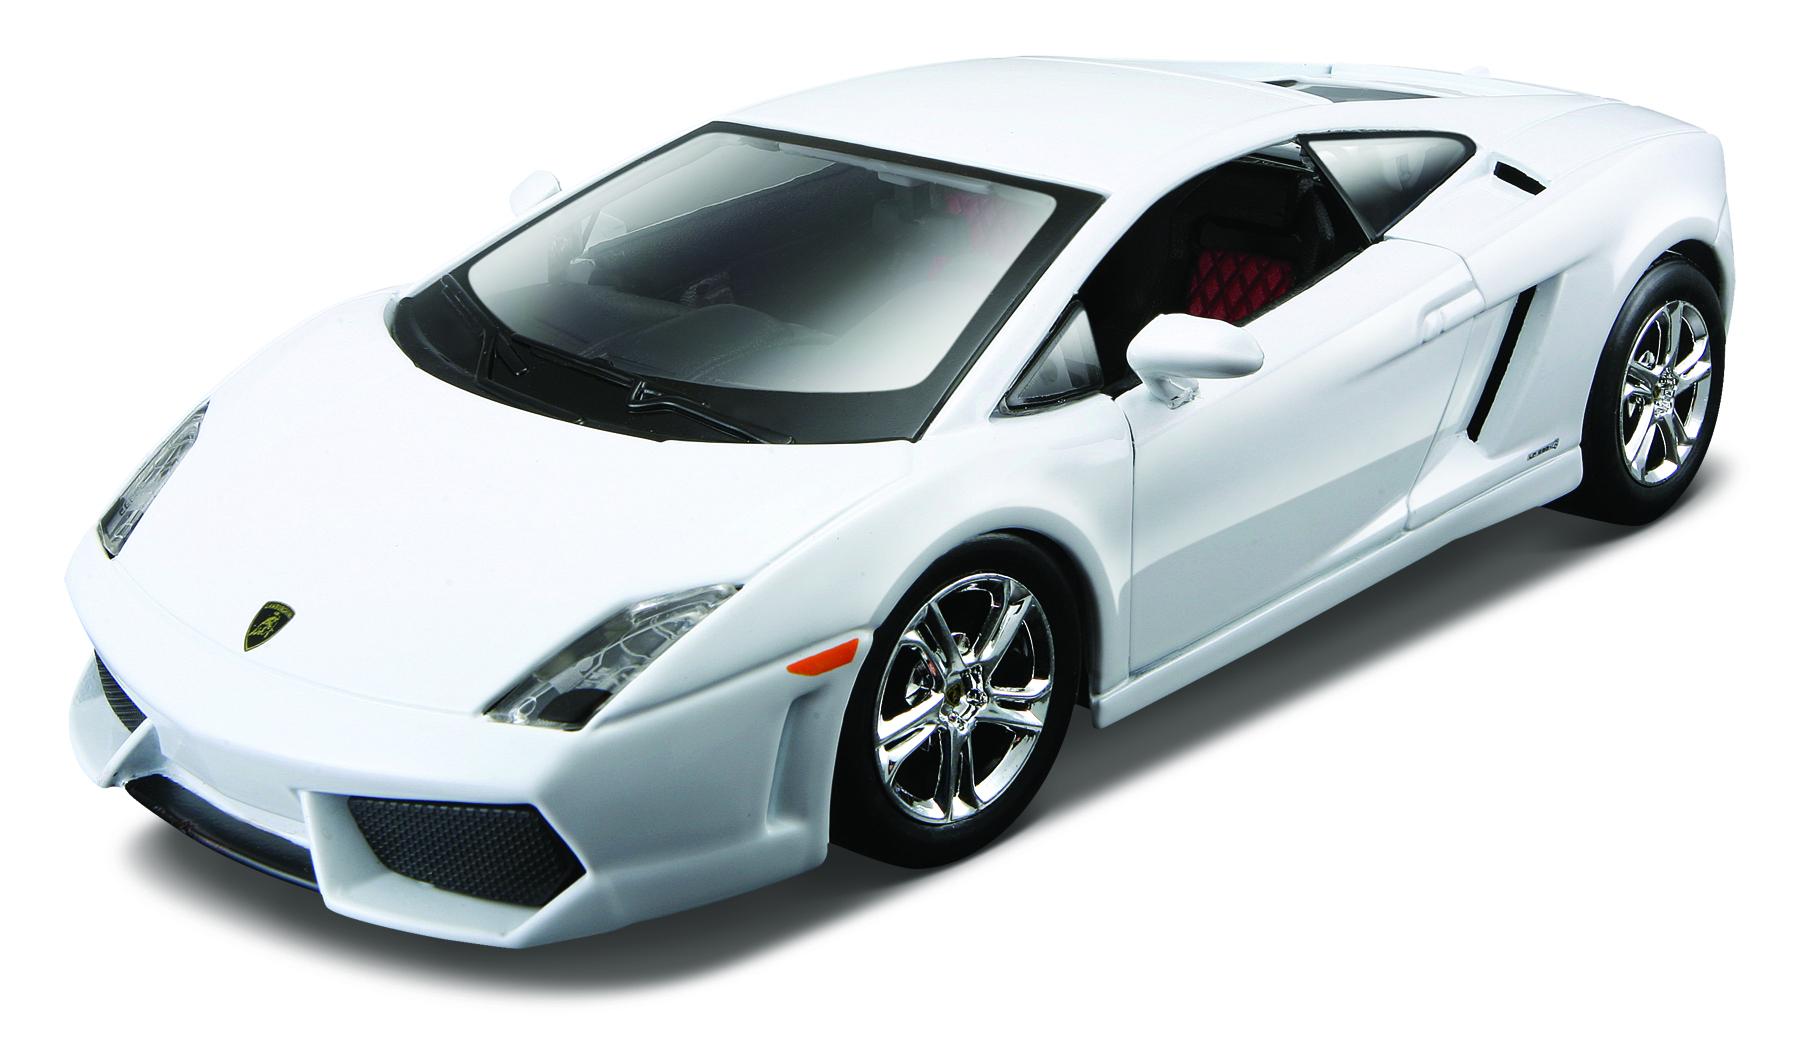 Masinuta Maisto Lamborghini Gallardo LP700-4